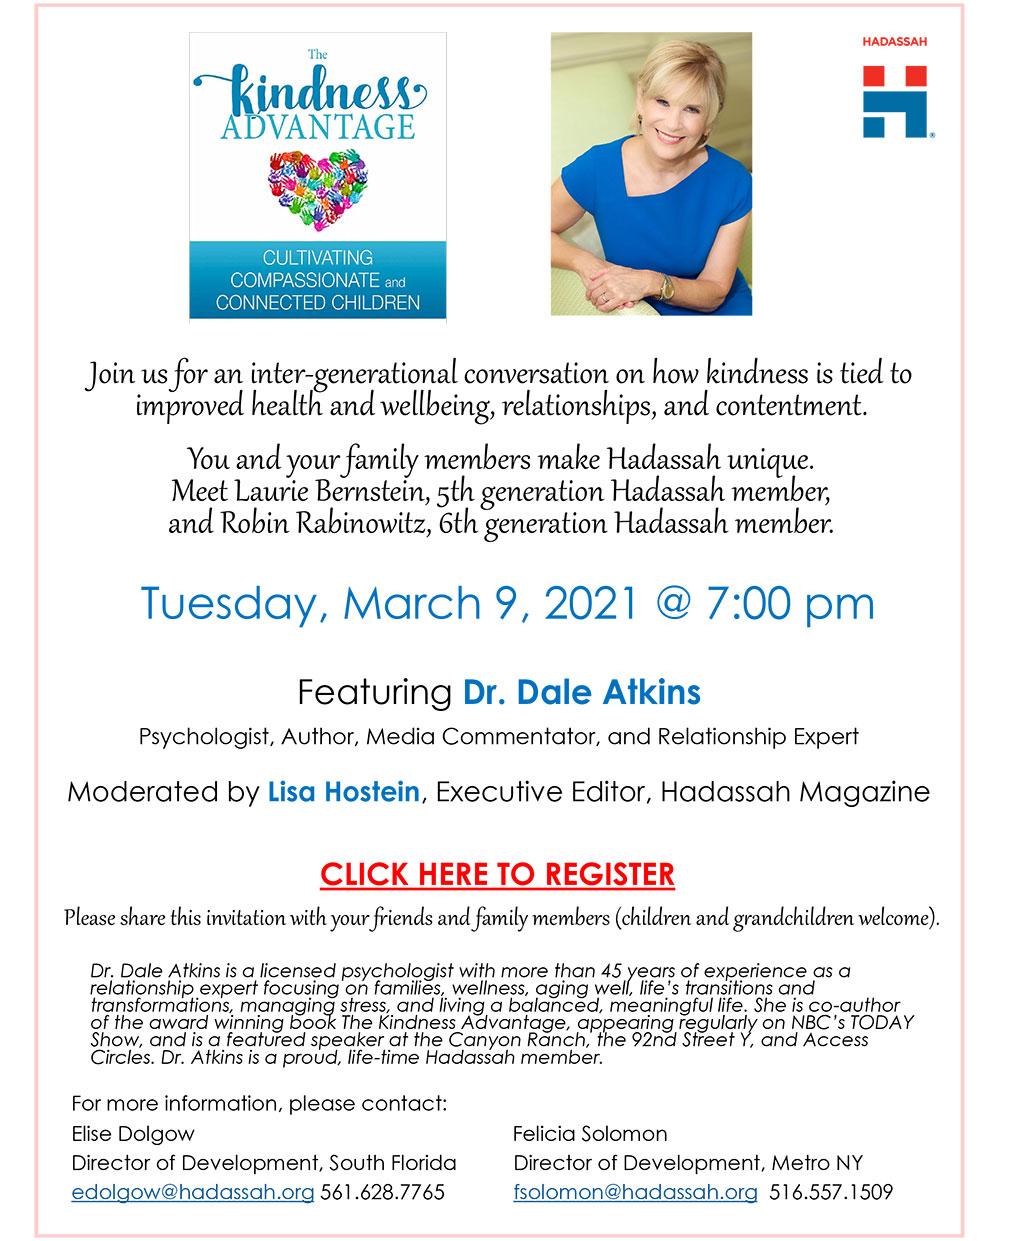 Mar 9 2021 Hadassah Kindness Advantage with Dr. Dale Atkins